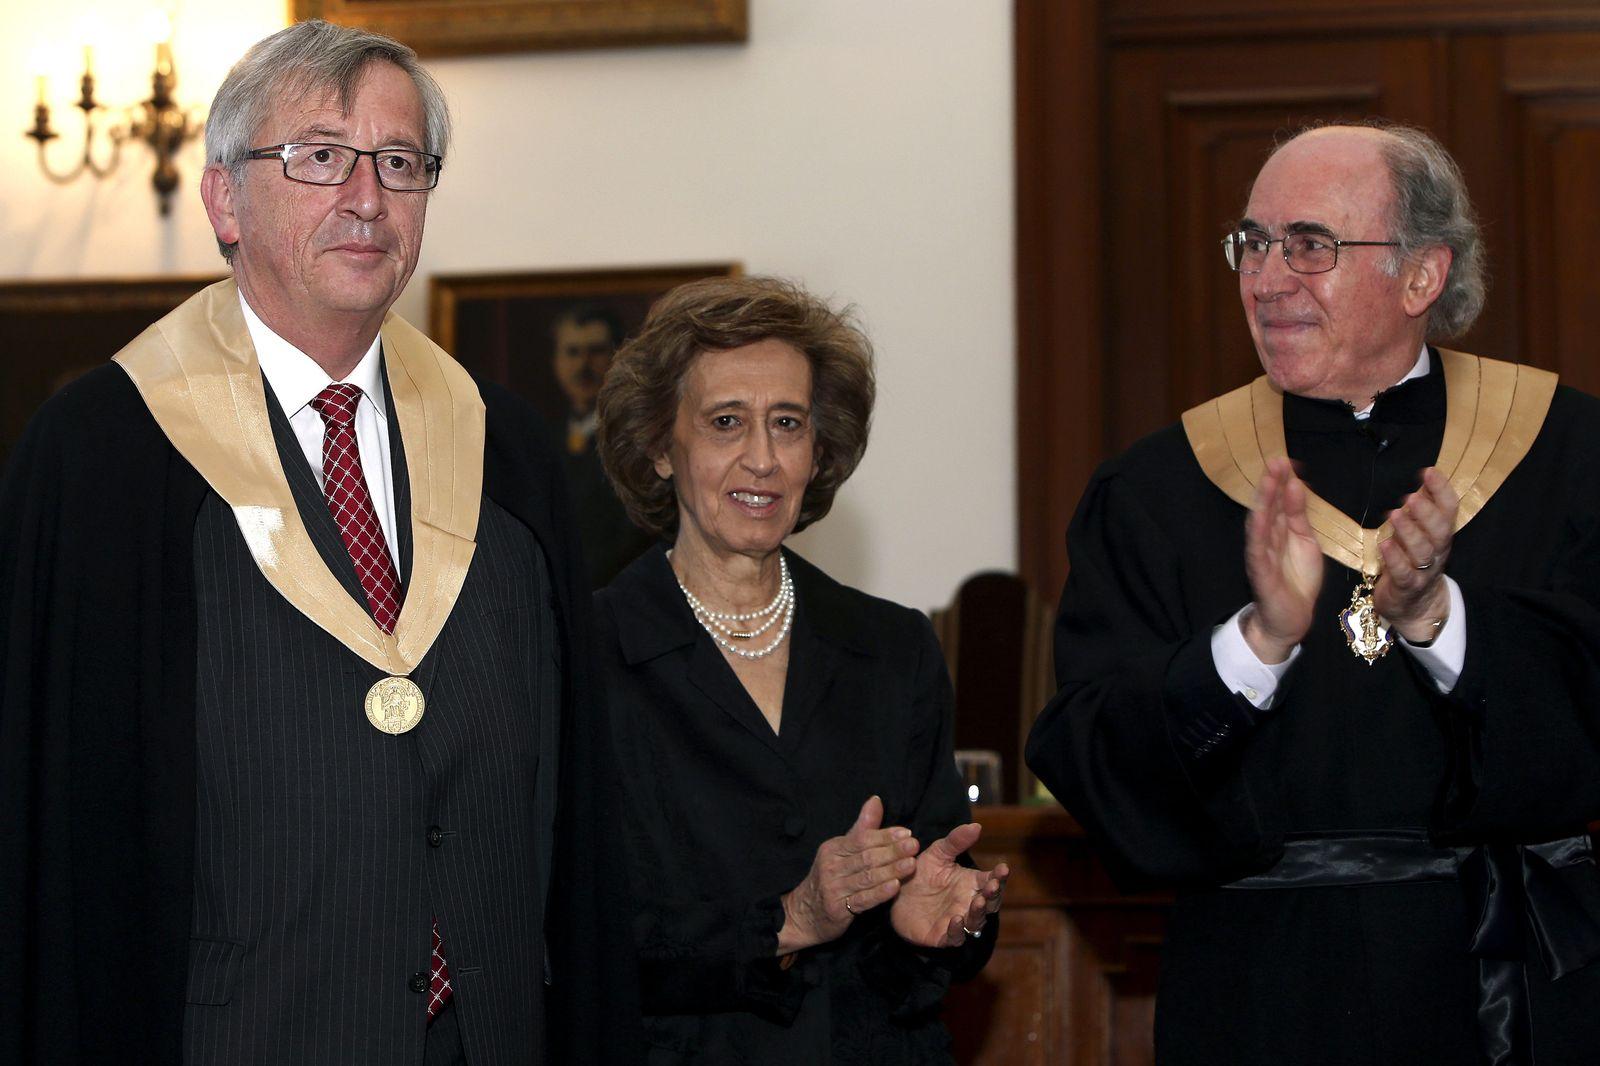 Manuela Ferreira Leite / Finanzkrise Portugal